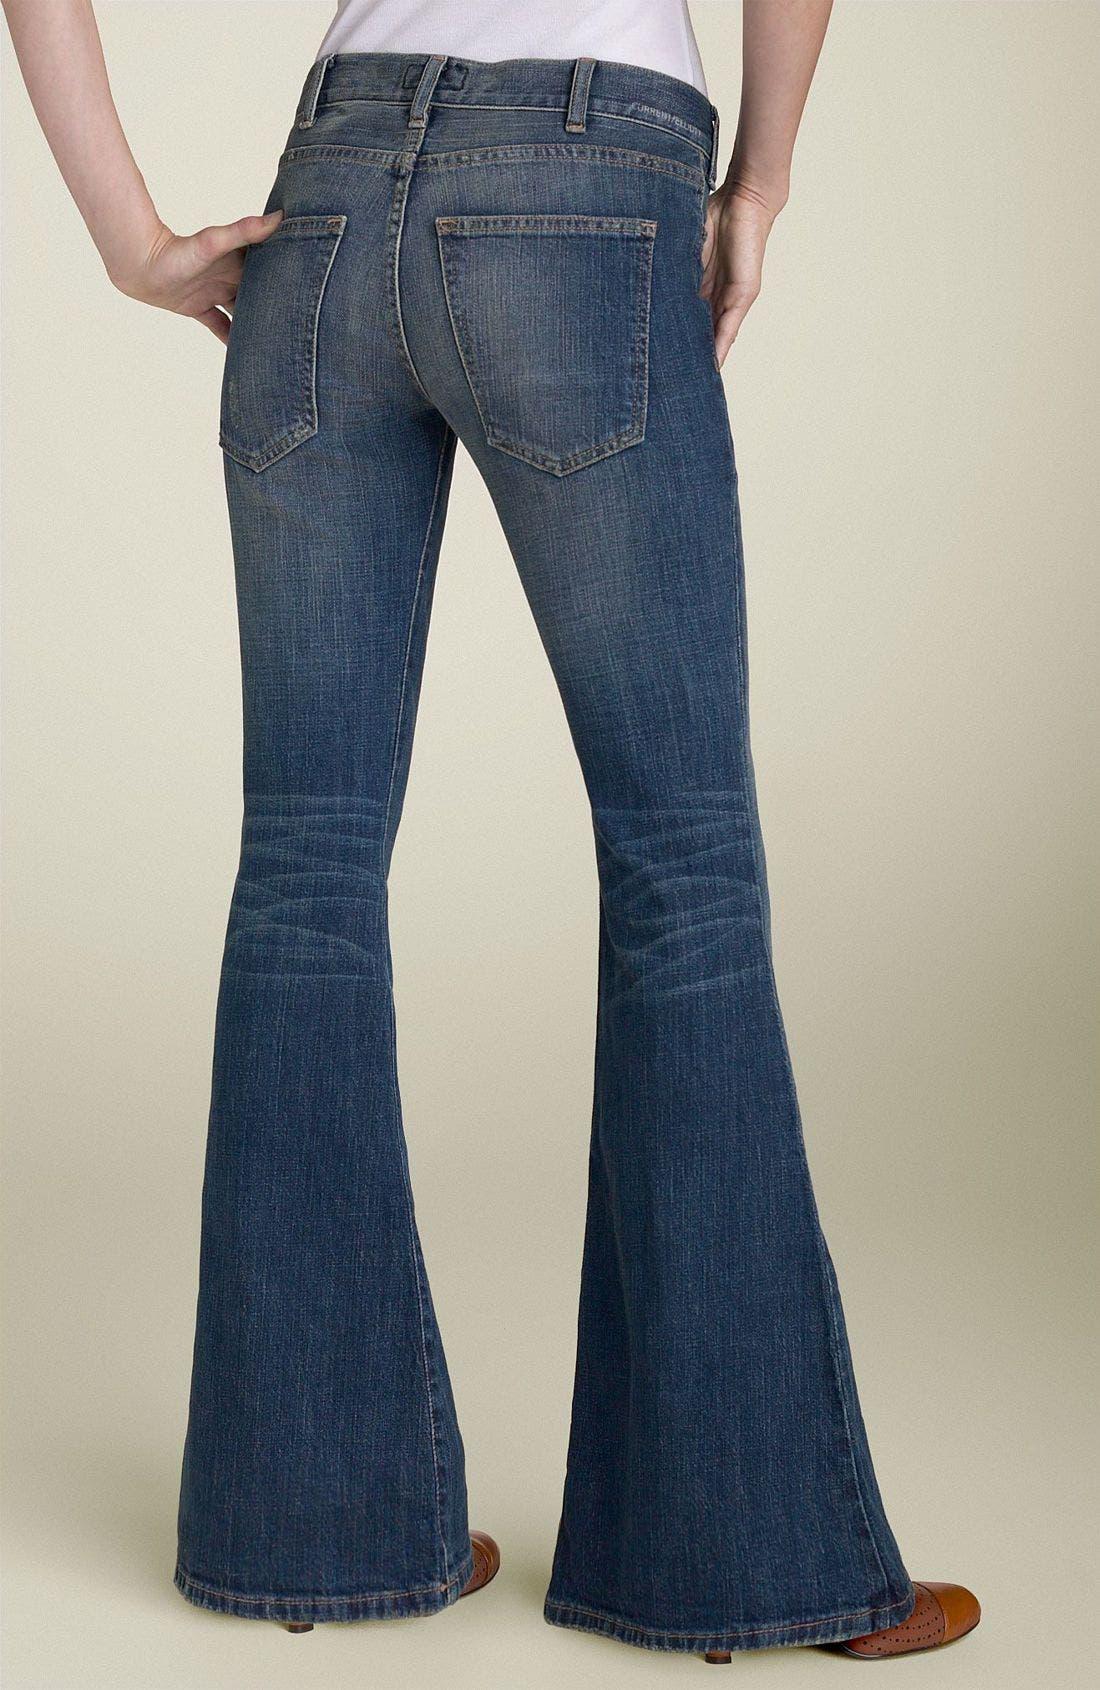 CURRENT/ELLIOTT,                             'The Elephant Bell' Flare Leg Stretch Jeans,                             Alternate thumbnail 2, color,                             465